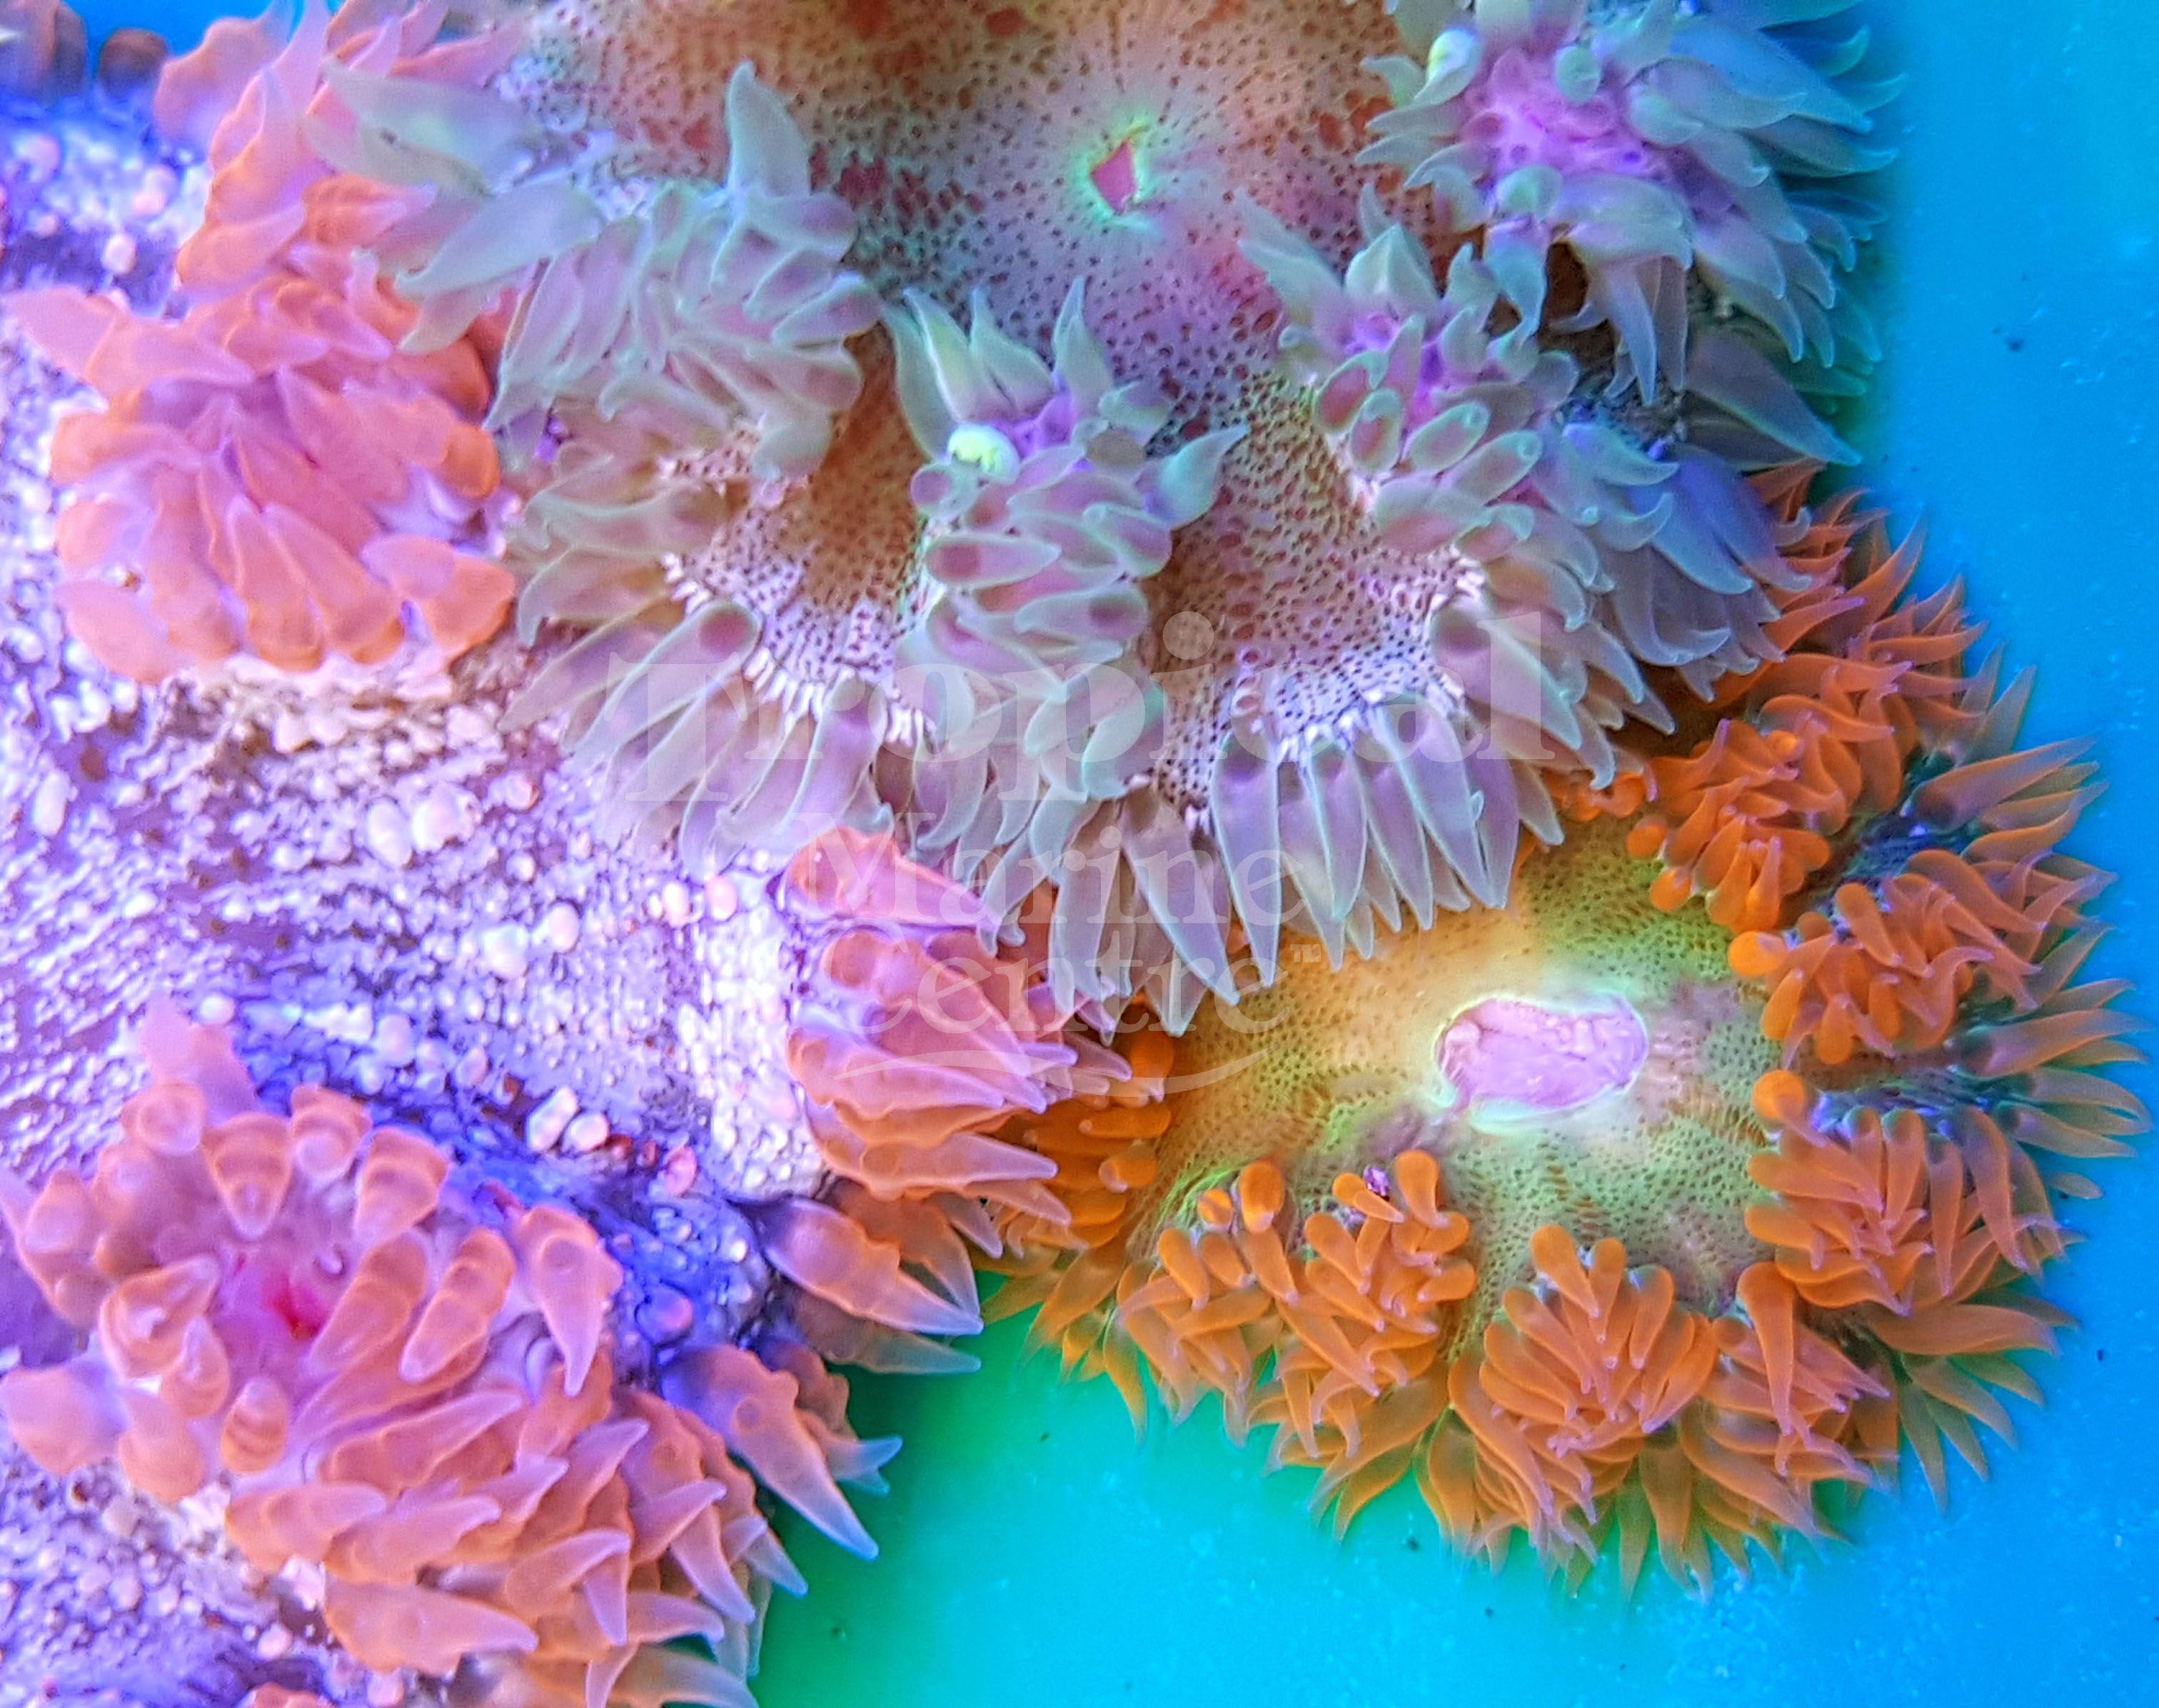 Rock Flower Anemones Tmc Tropicalmarinecentre Tmclookforthelabel Rockanemone Rockfloweranemone Rockne Saltwater Aquarium Fish Saltwater Aquarium Anemone